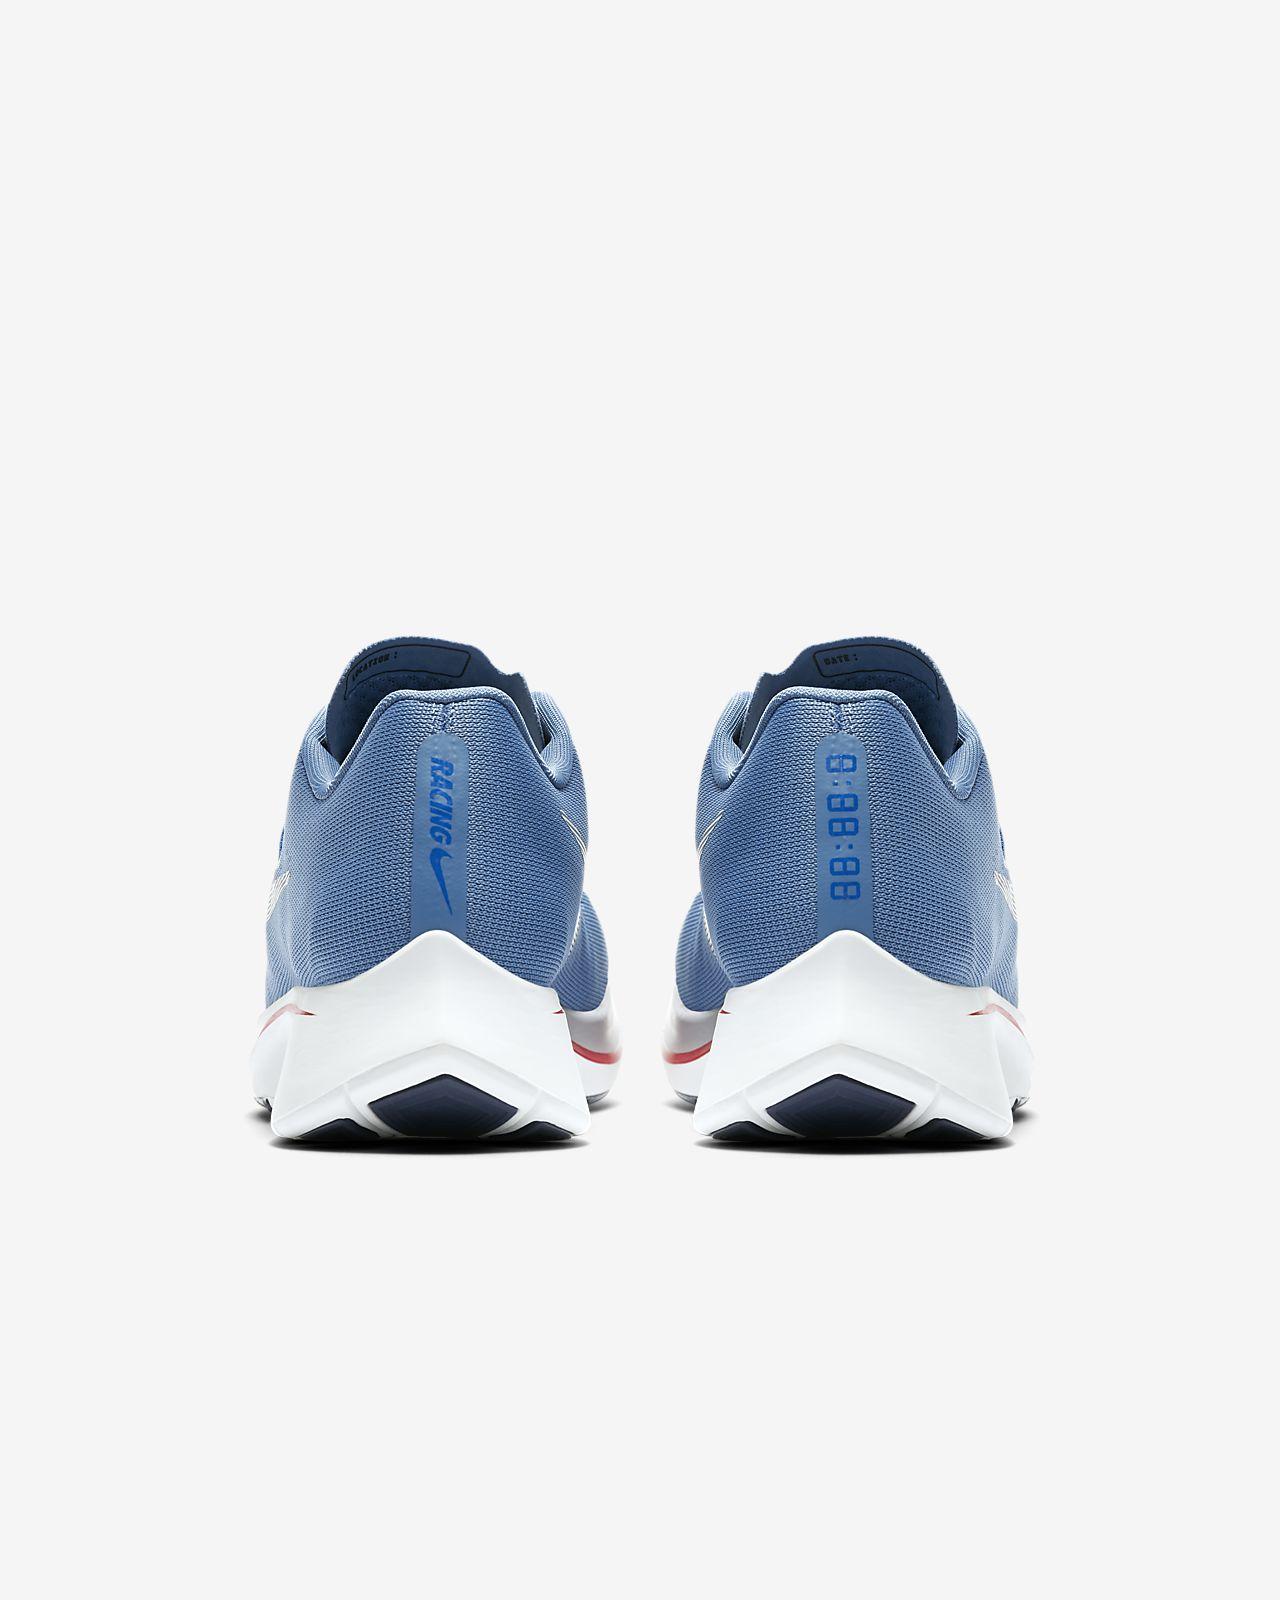 Nike Elite SI Trainers Mens Trainers Shop Mens Trainers COLOUR-blue/navy